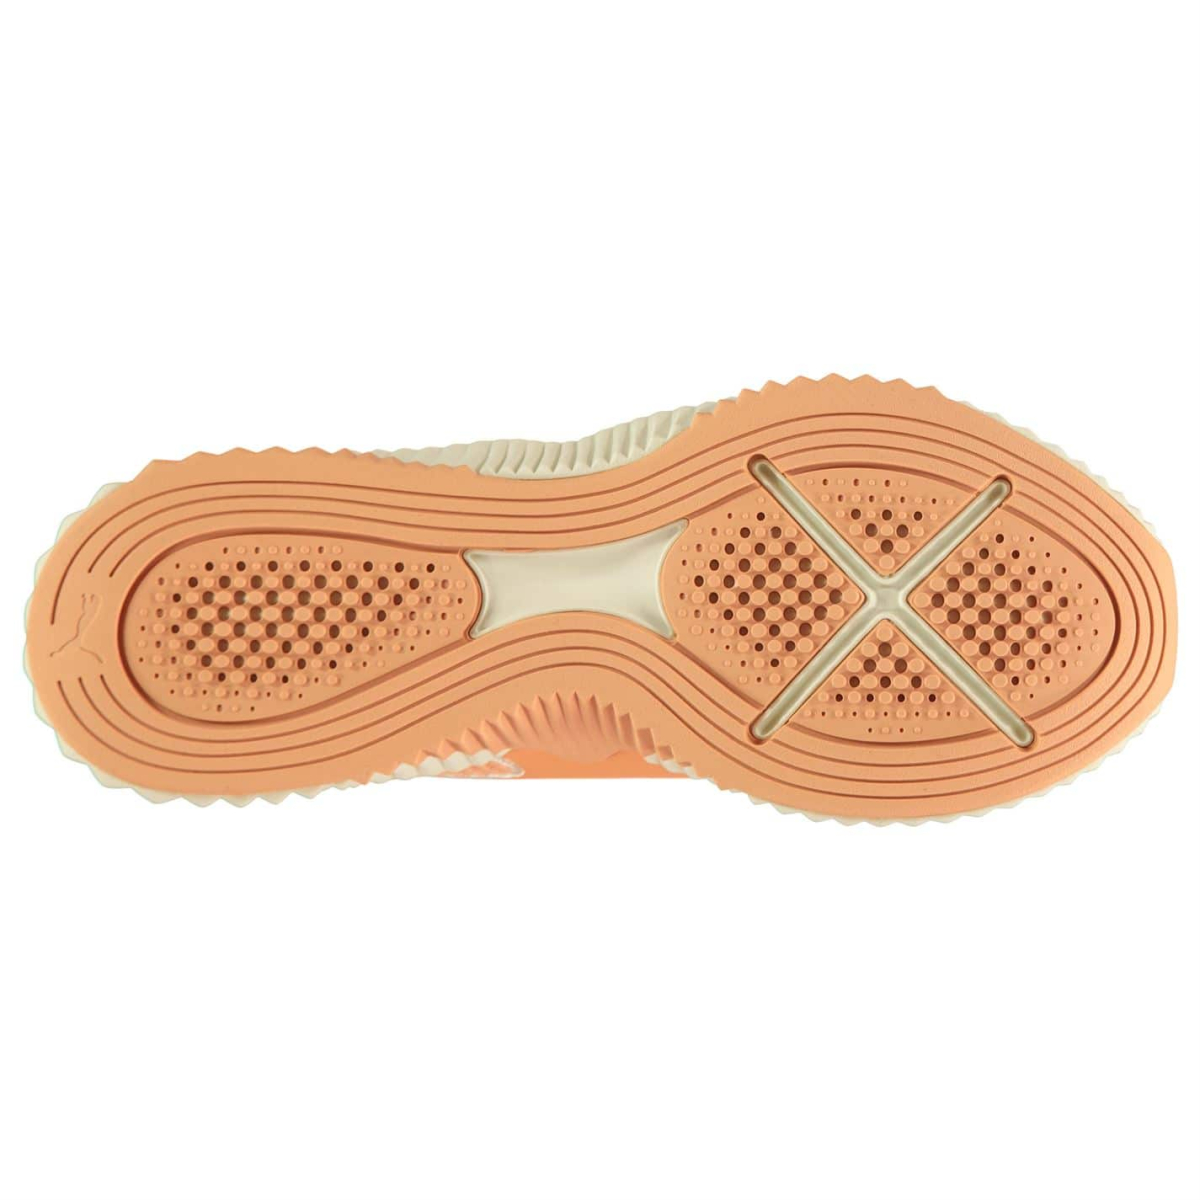 Puma-Defy-Turnschuhe-Damen-Sneaker-Sportschuhe-Laufschuhe-9005 Indexbild 12